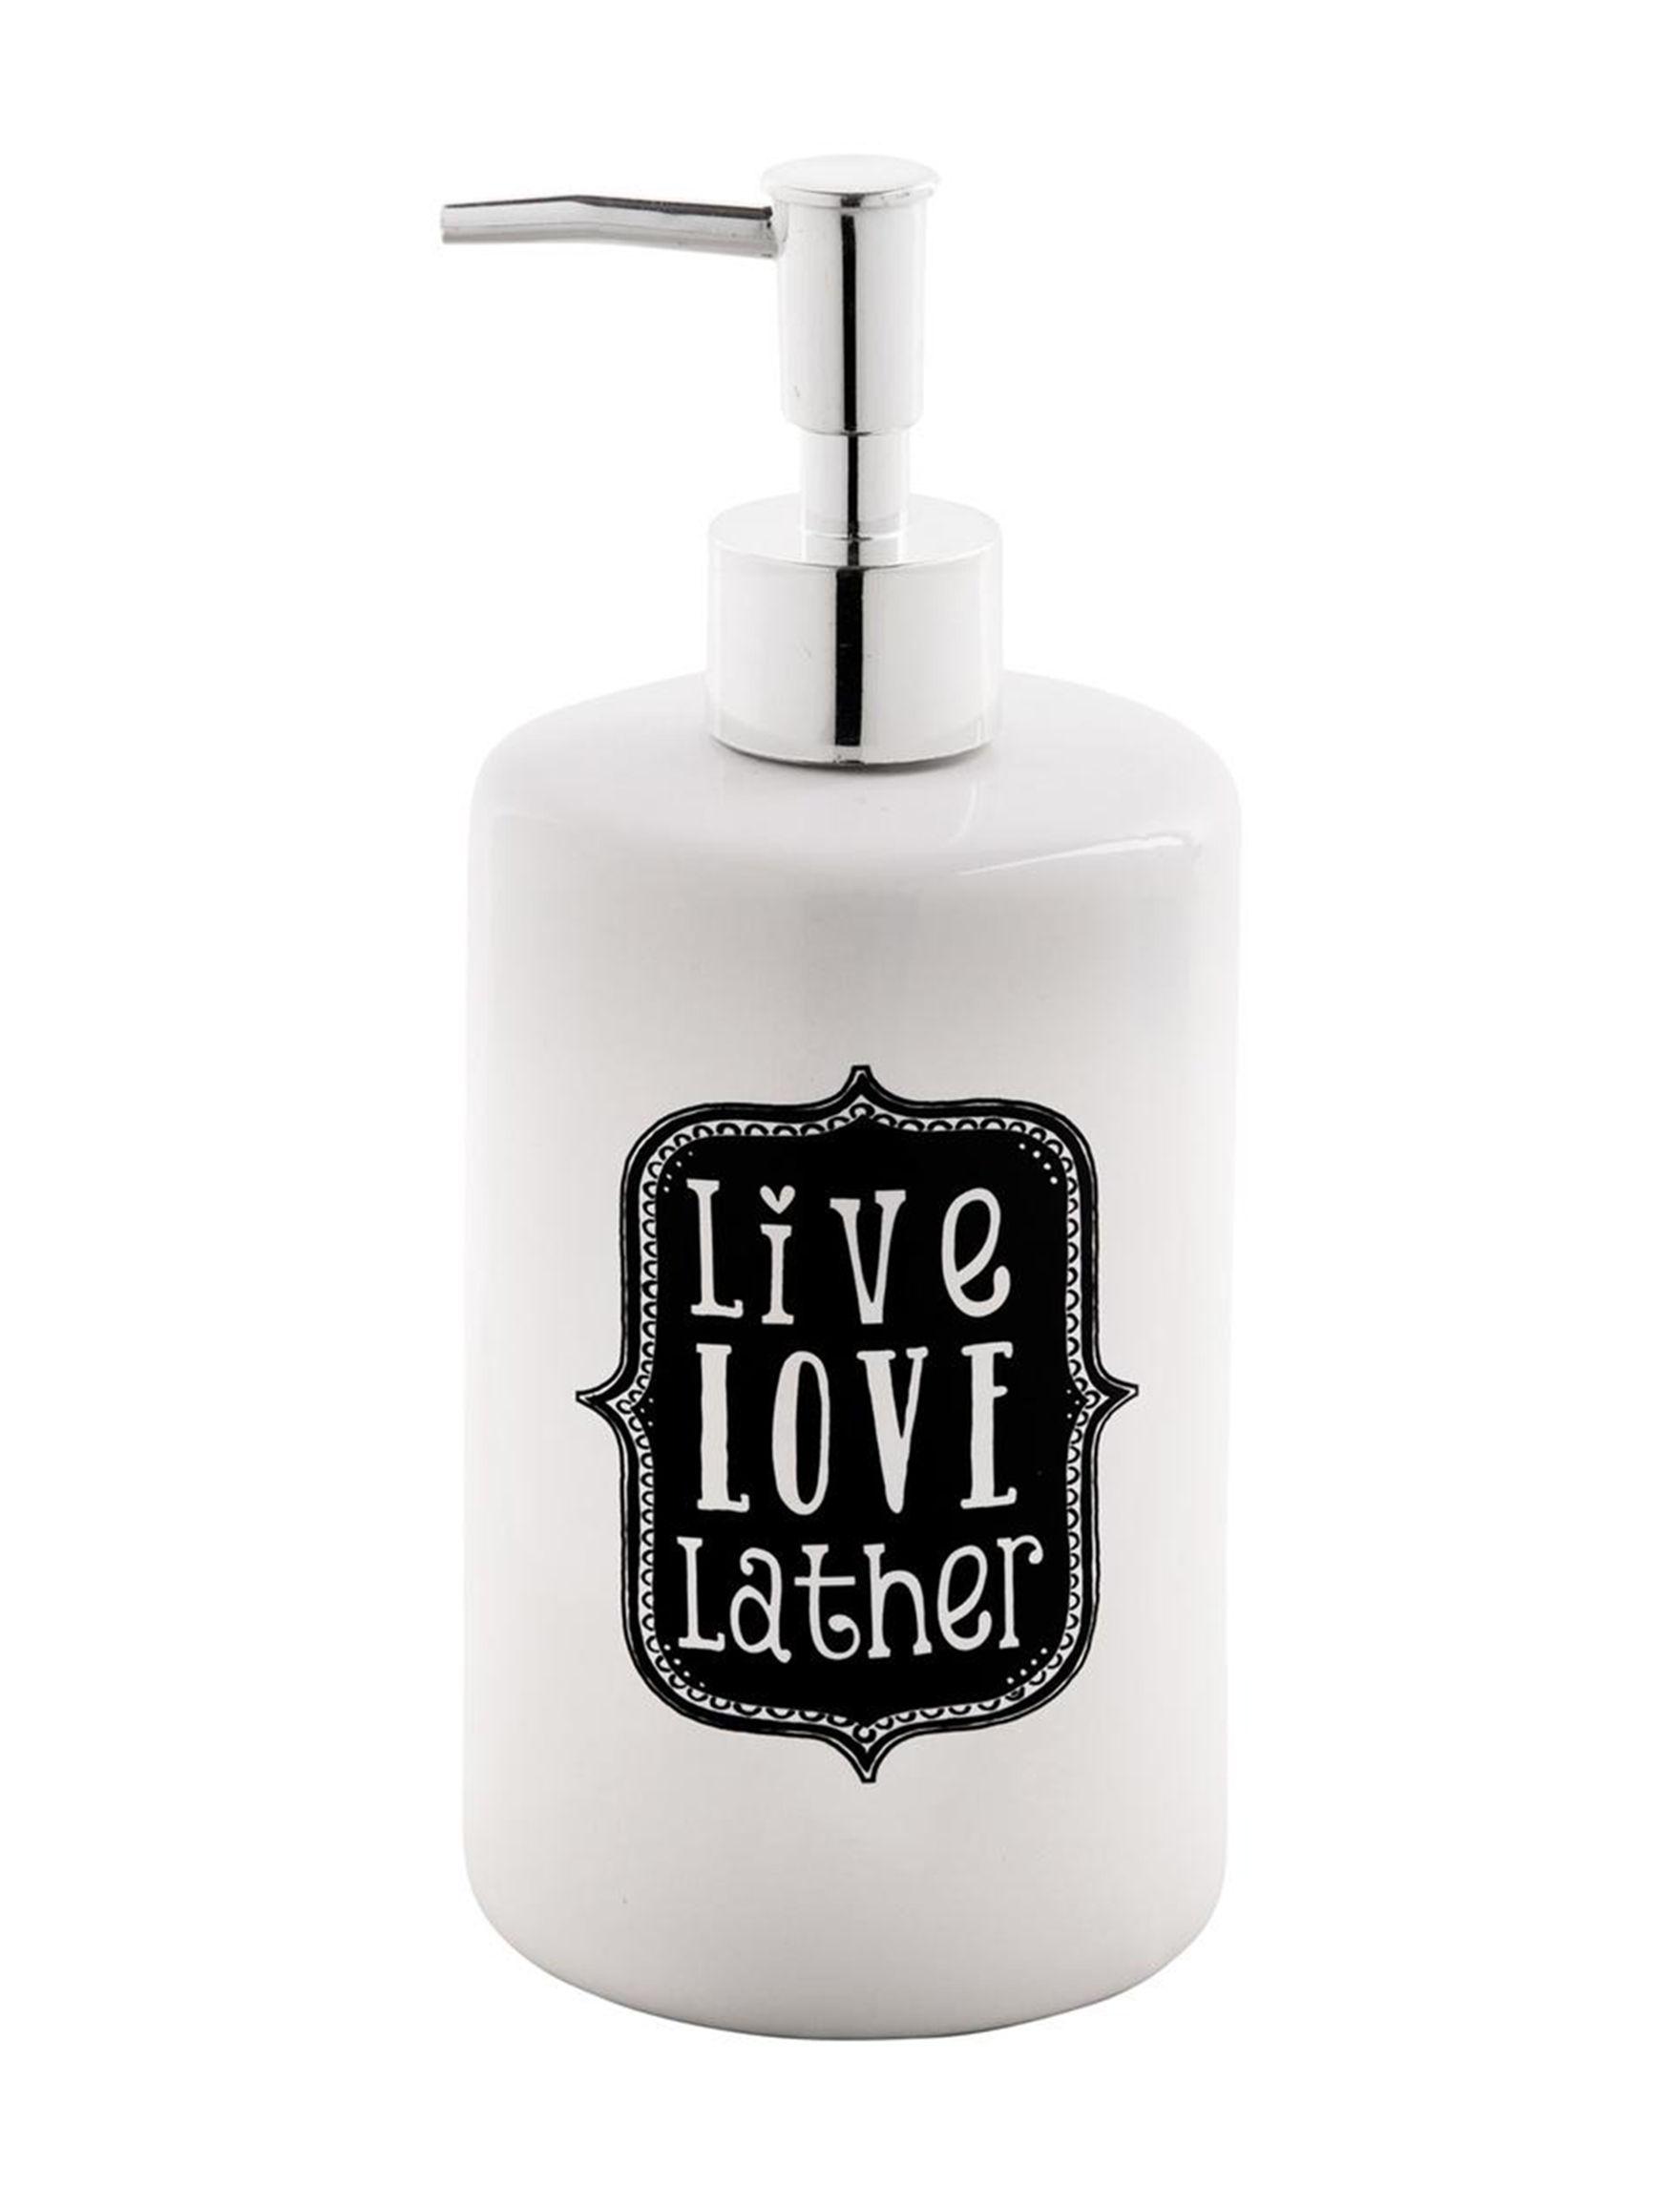 Home Essentials White / Black / Silver Soap & Lotion Dispensers Bath Accessories